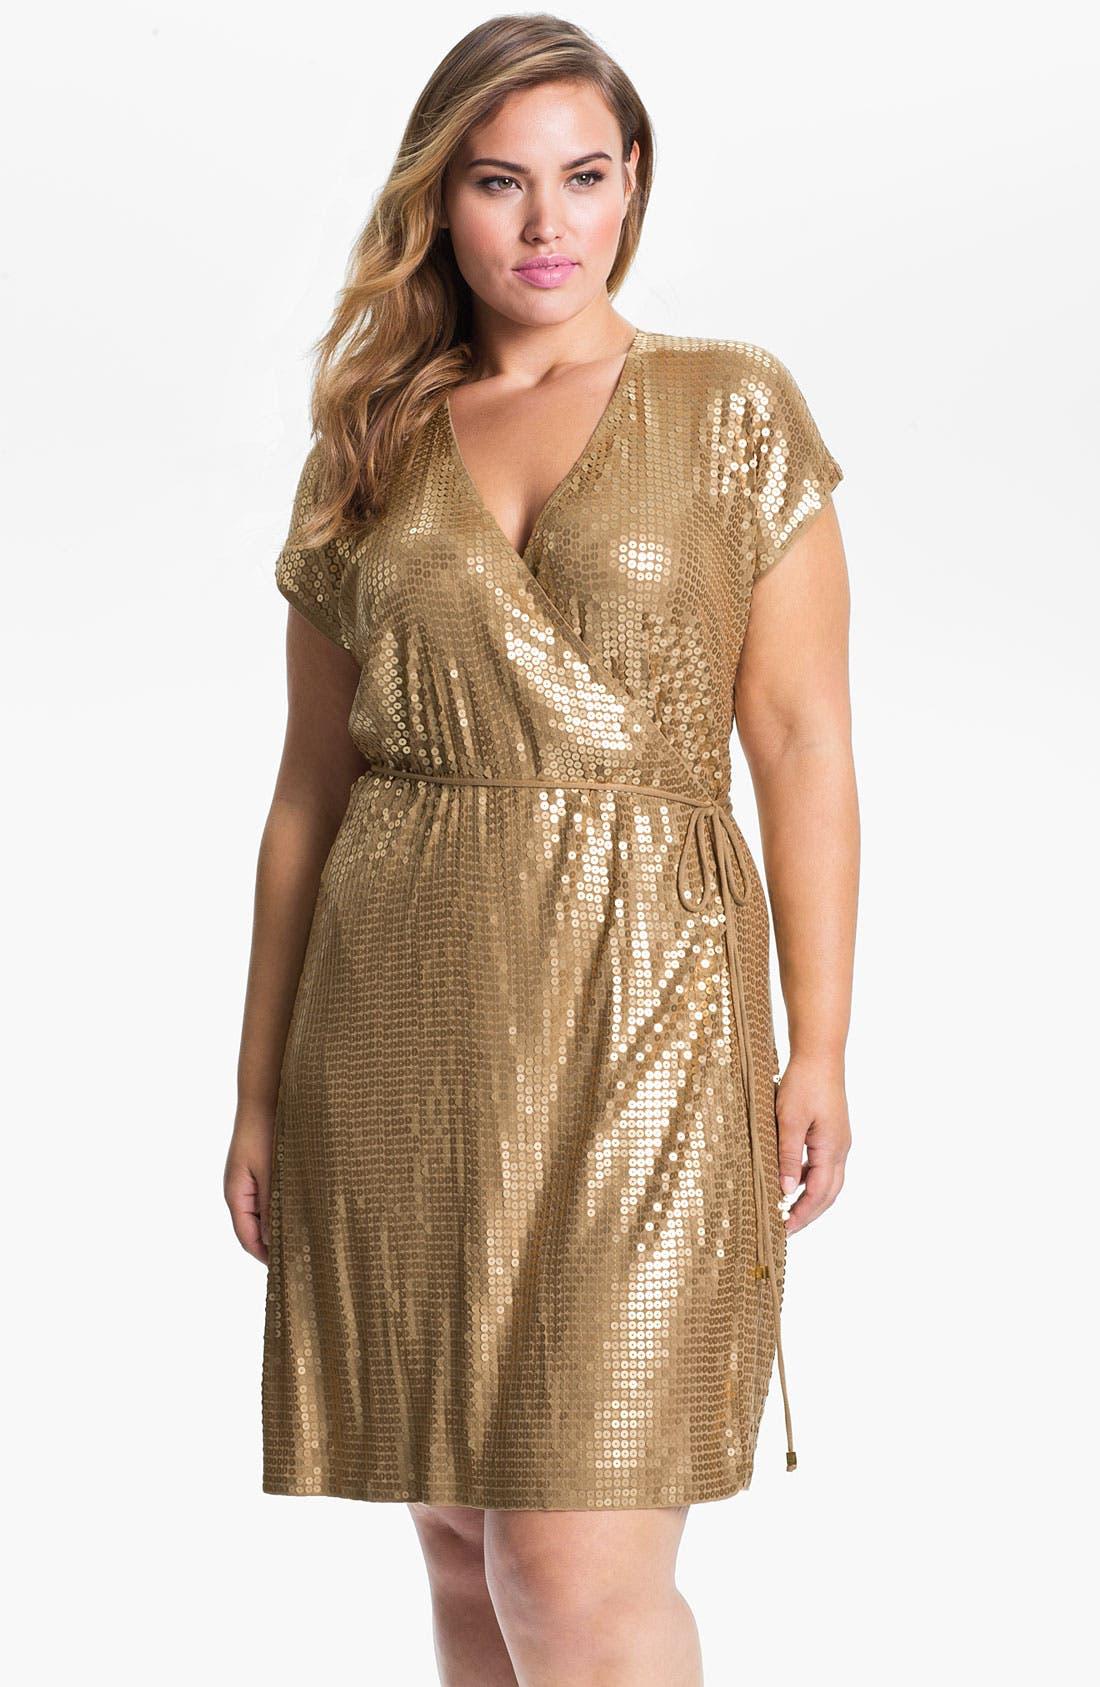 Alternate Image 1 Selected - MICHAEL Michael Kors Sequin Wrap Dress (Plus)